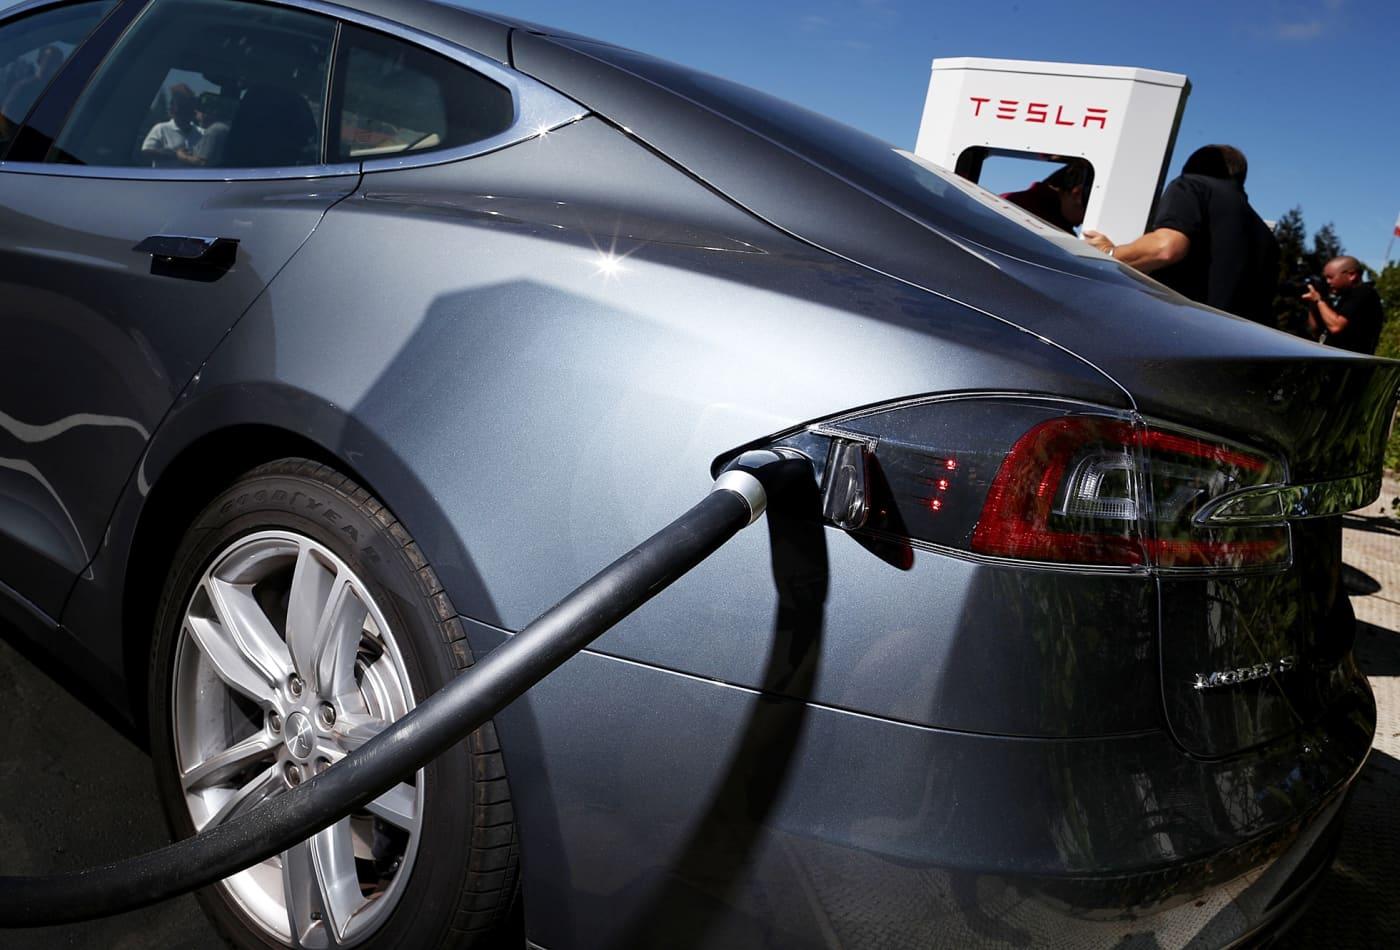 Jim Cramer calls Tesla a 'tech company,' says 2020 is its 'breakout year'